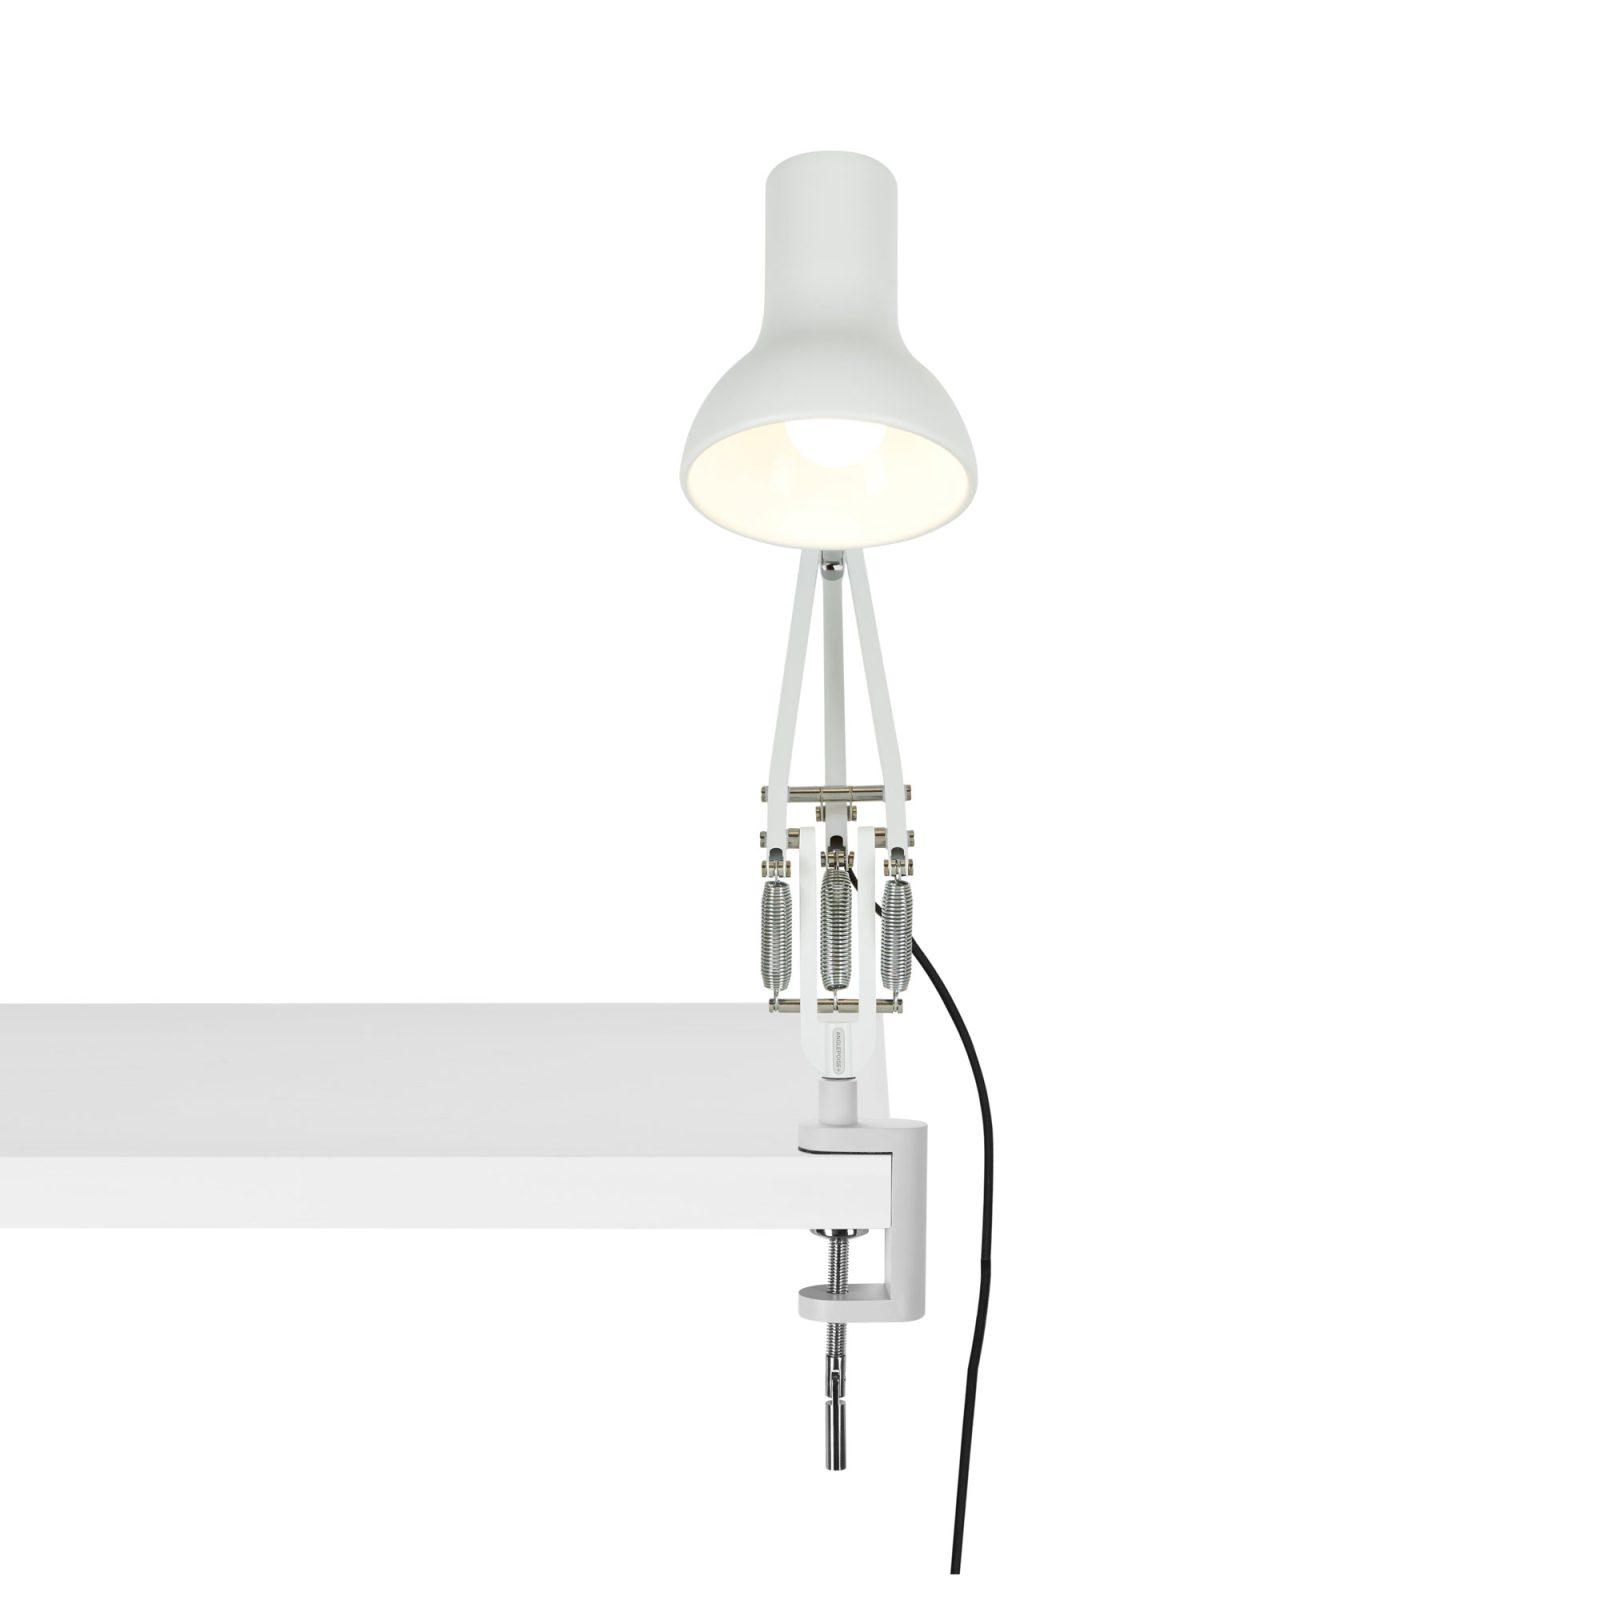 type-75-mini-desk-lamp-with-desk-clamp-7